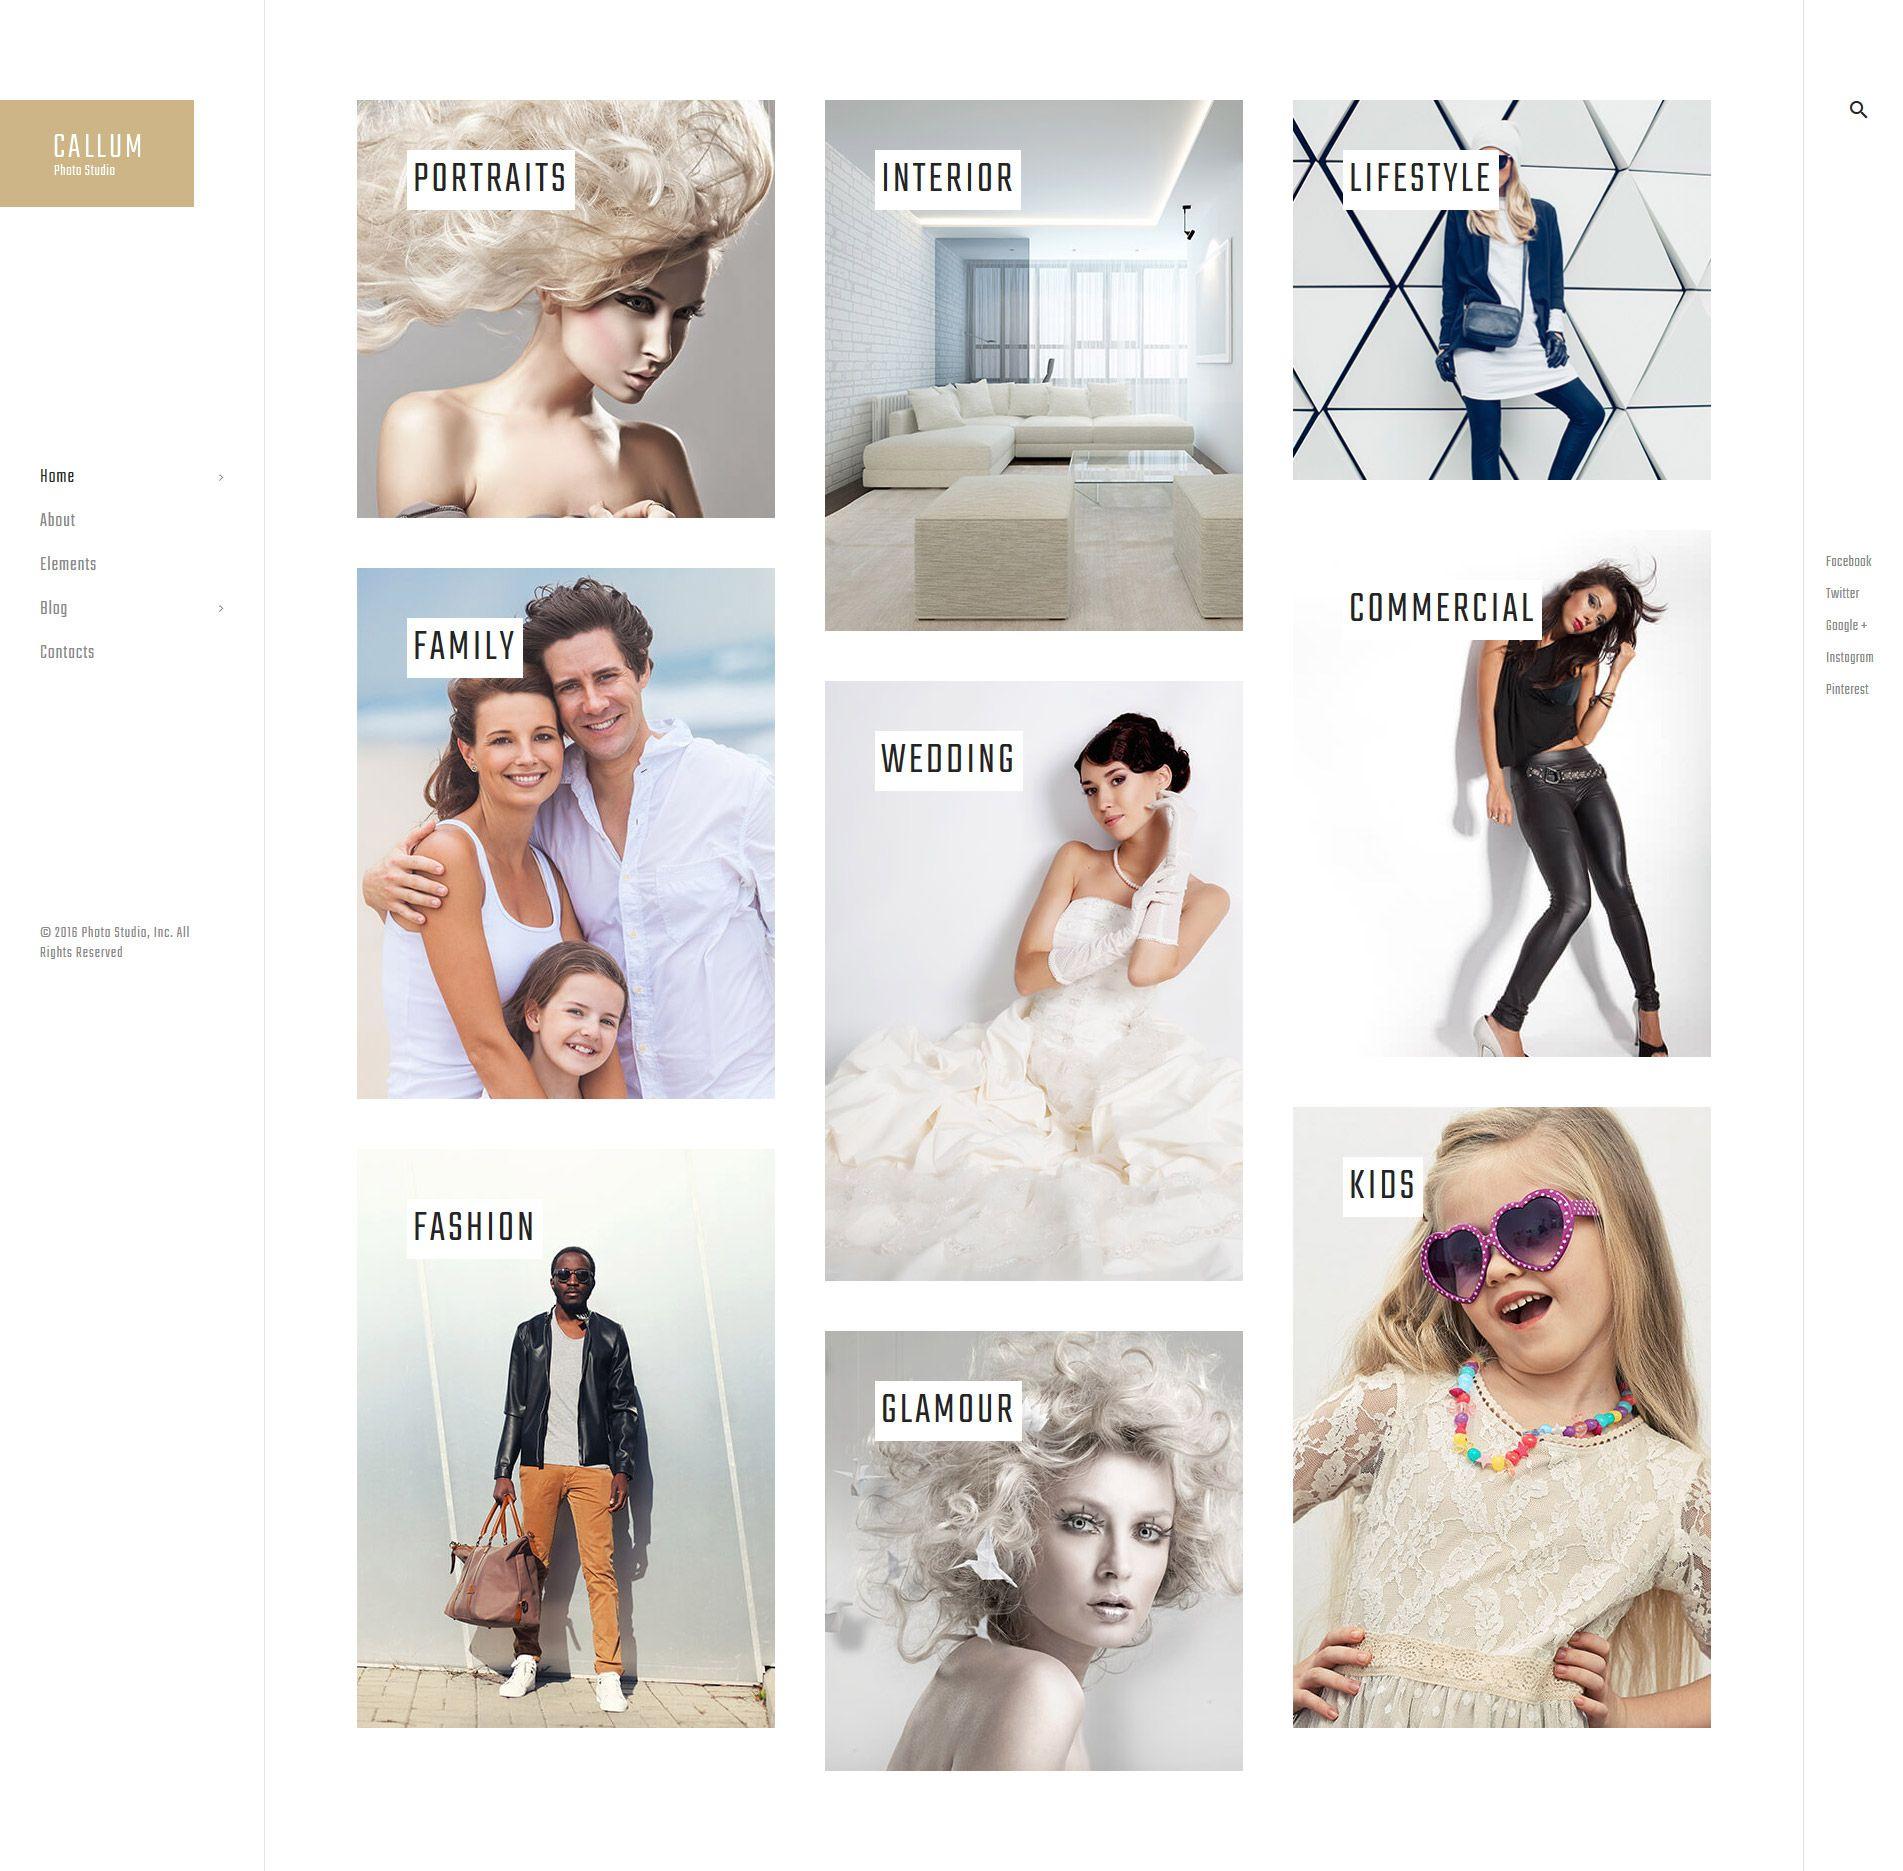 Callum - wedding photo gallery WordPress Theme | Wordpress, Online ...